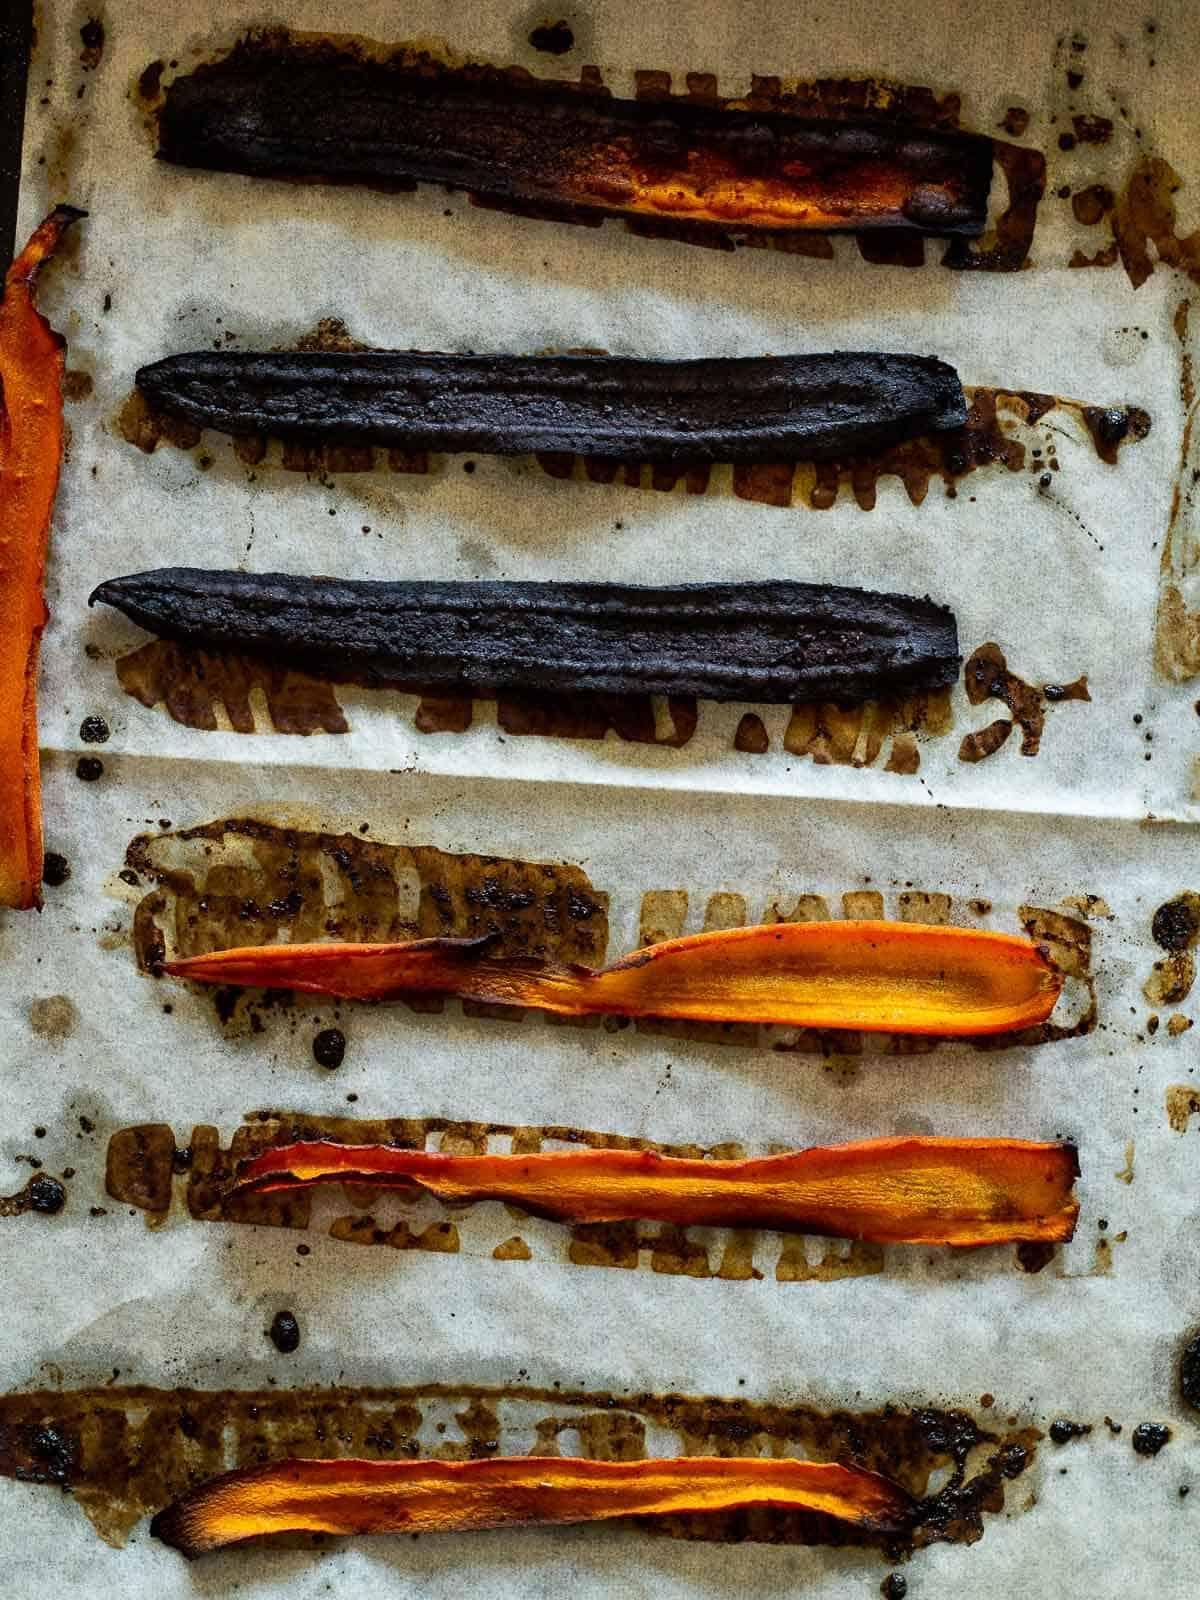 Burnt Carrot on parchment paper